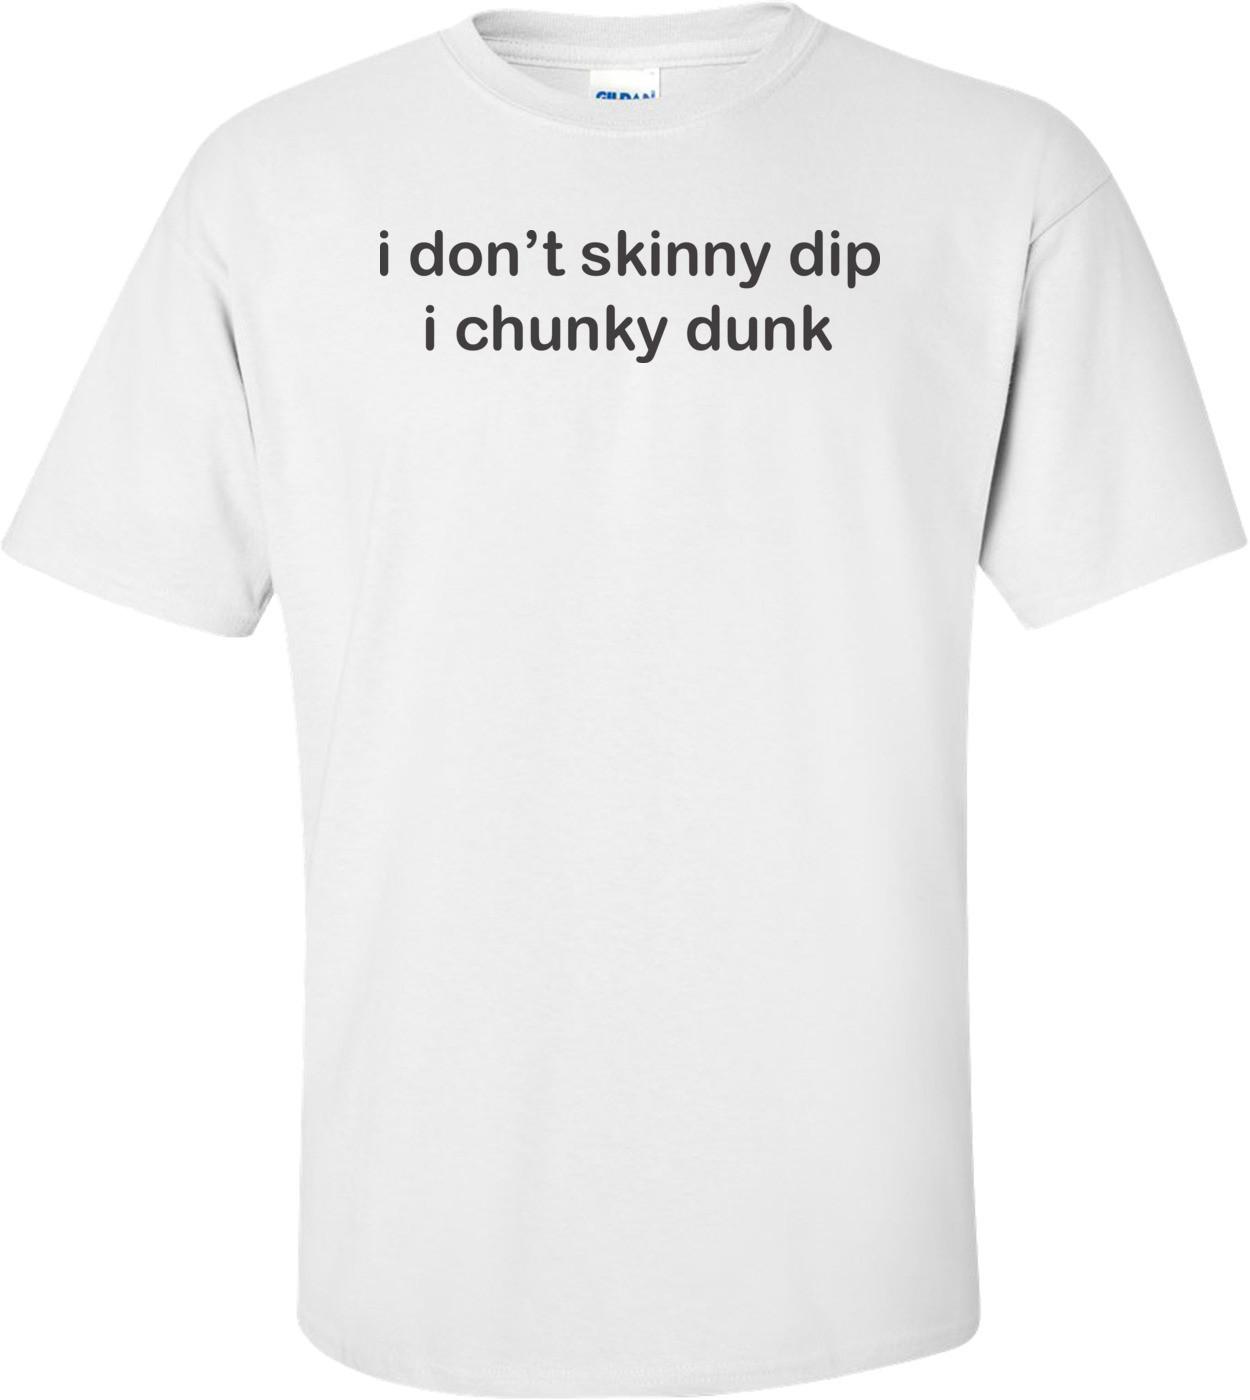 I Don't Skinny Dip I Chunky Dunk